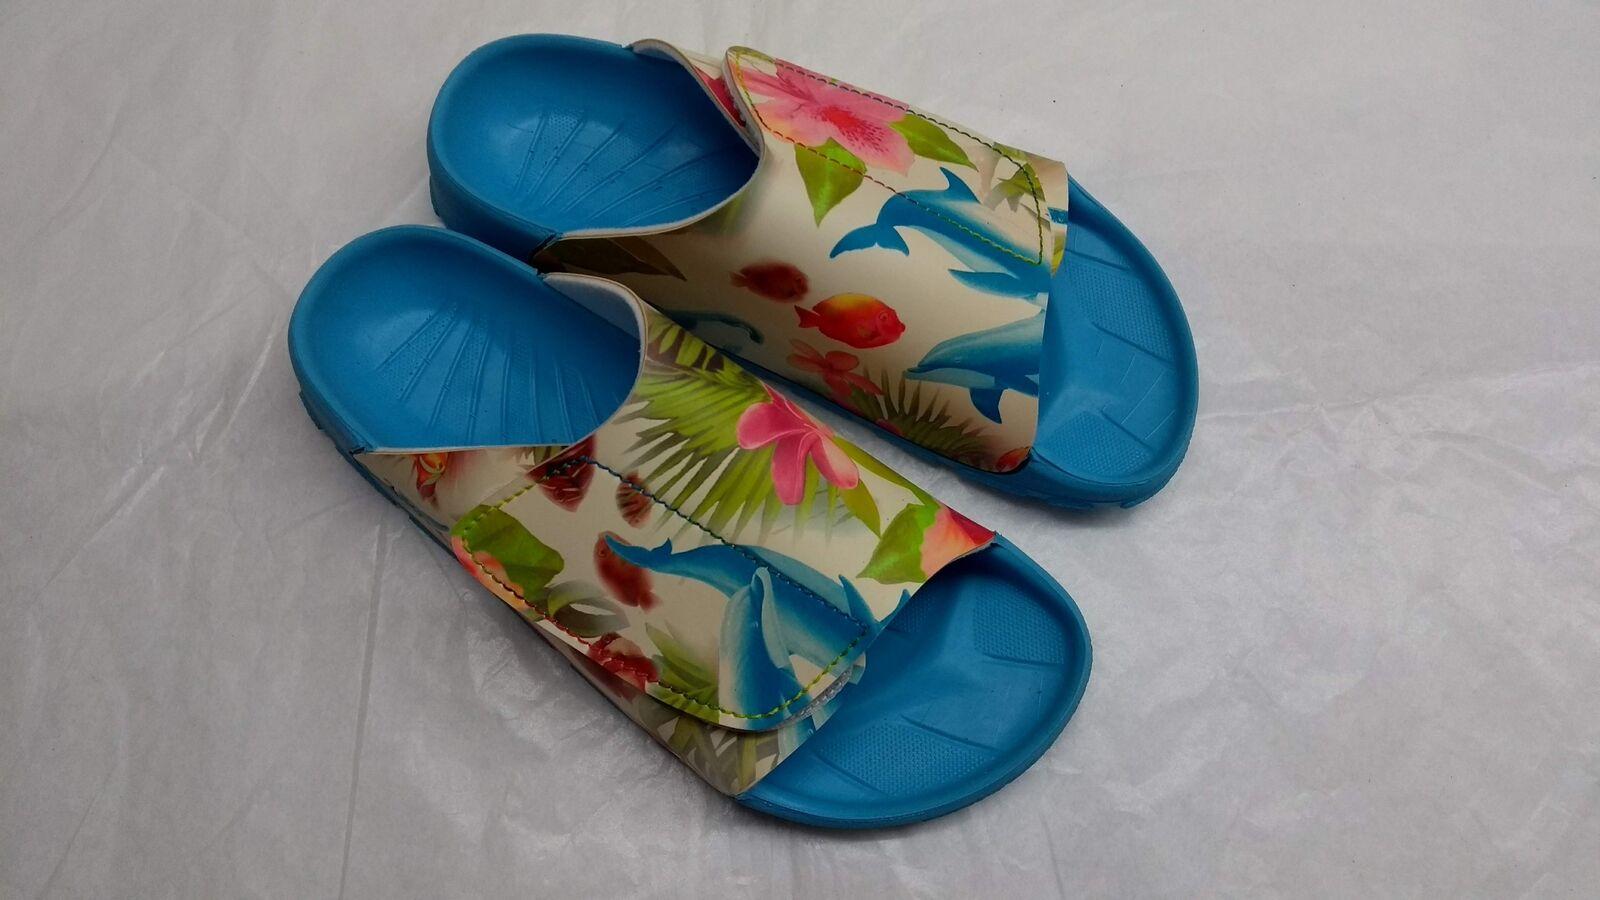 Birkis Samoa Slipper señora sandalia turquesa Lagoon 115433 white nuevo 115433 Lagoon 48277a